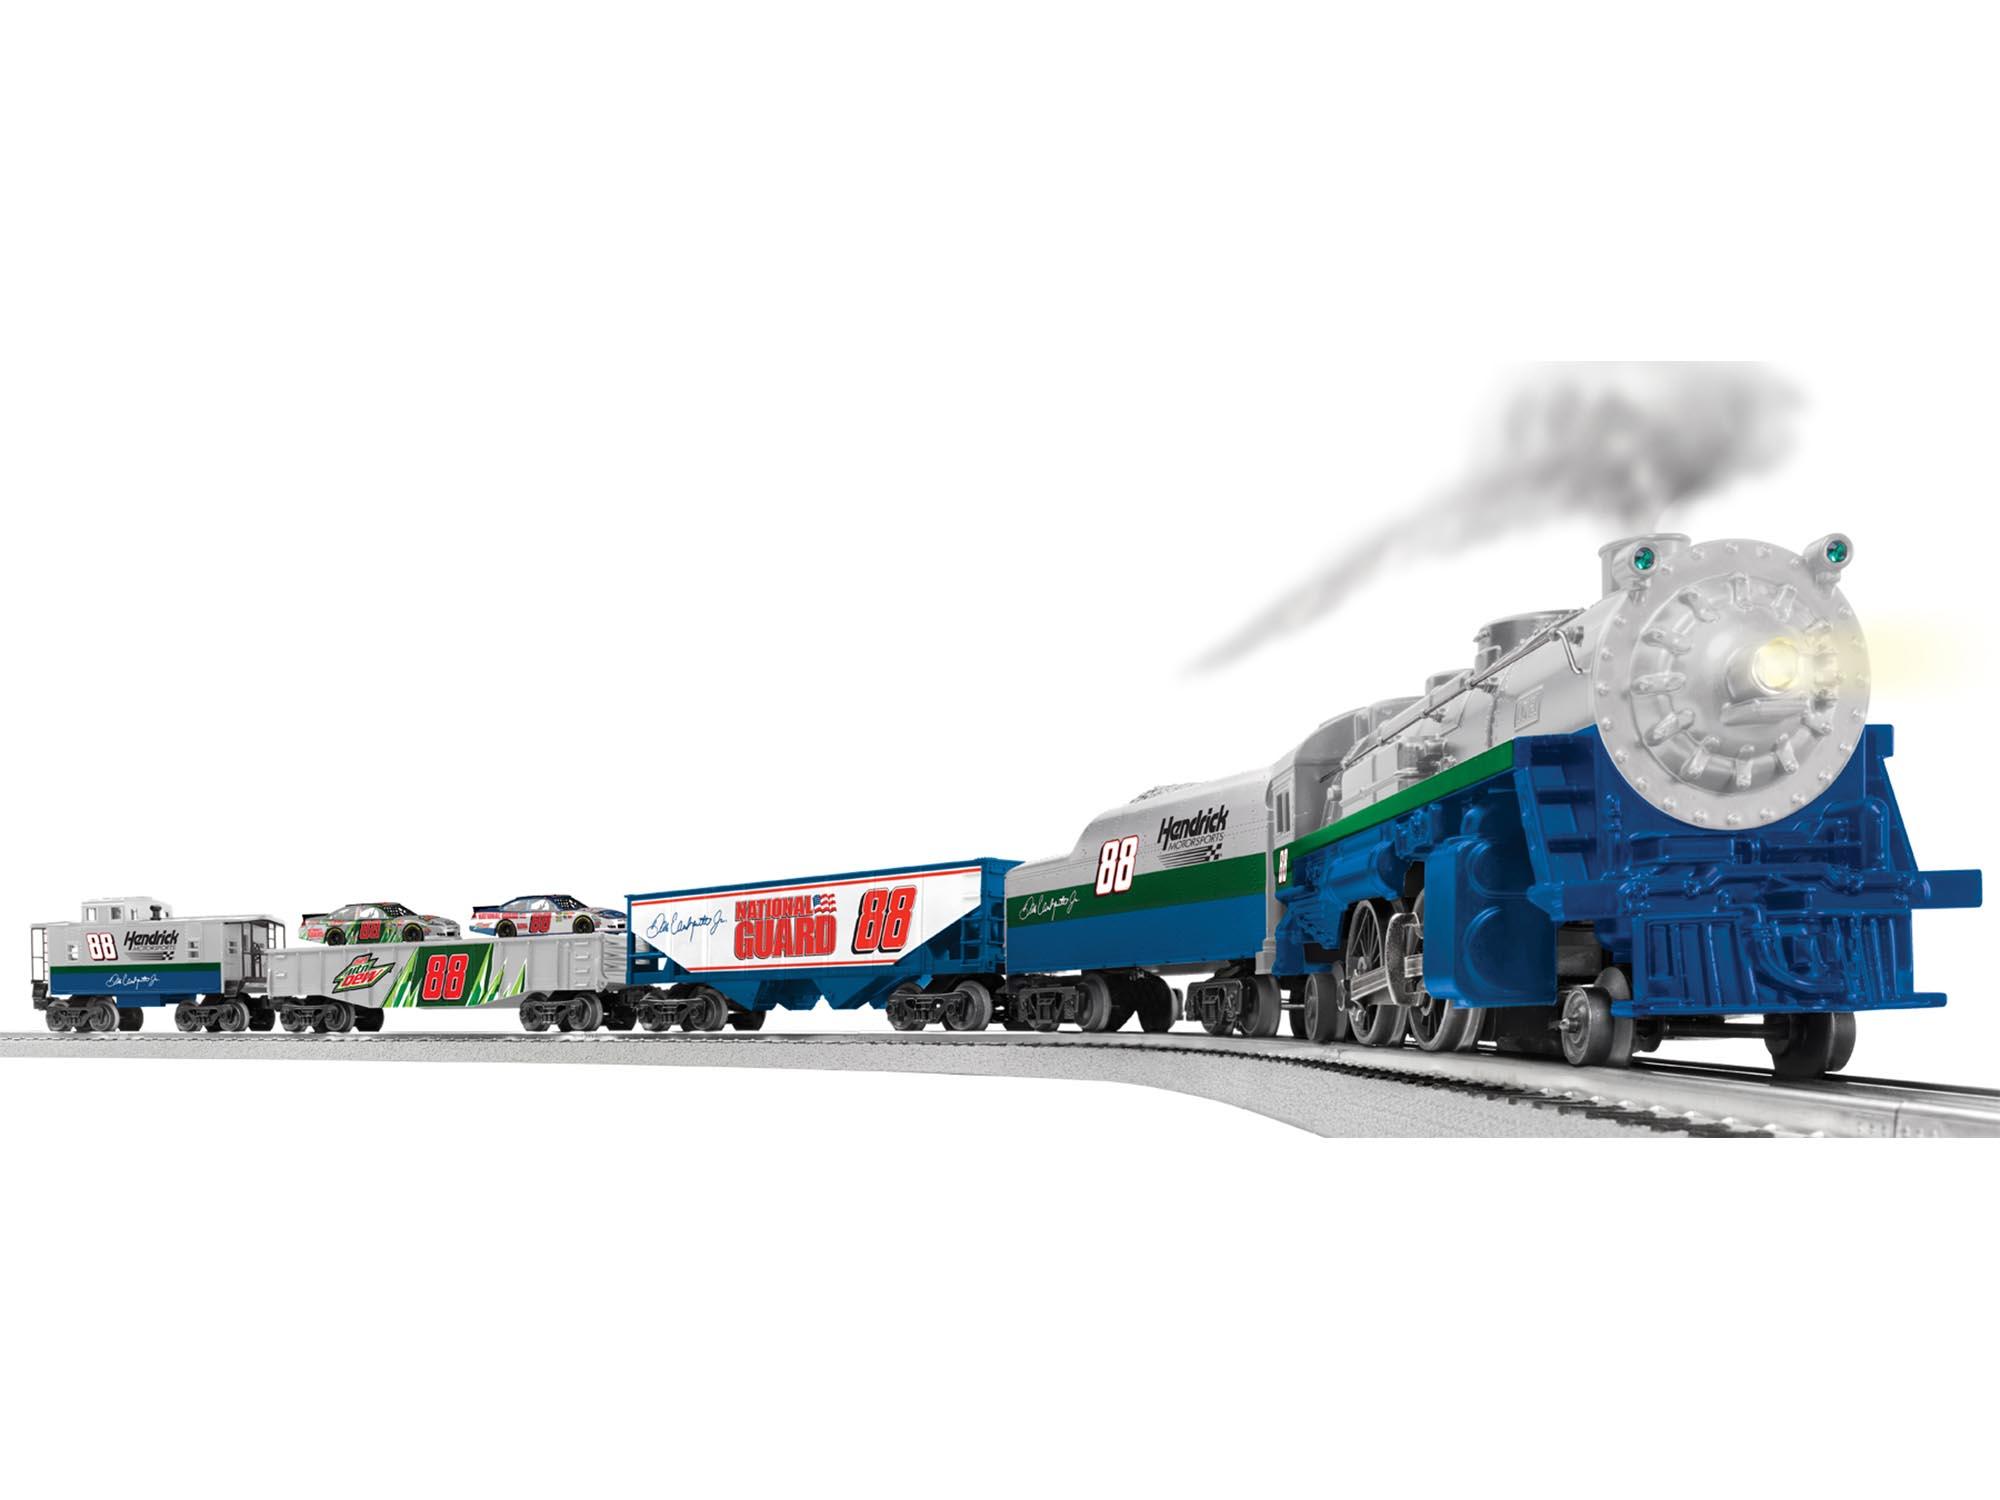 Lionel O T8828 Dale Earnhardt Jr. #88 Nascar Train Set ...